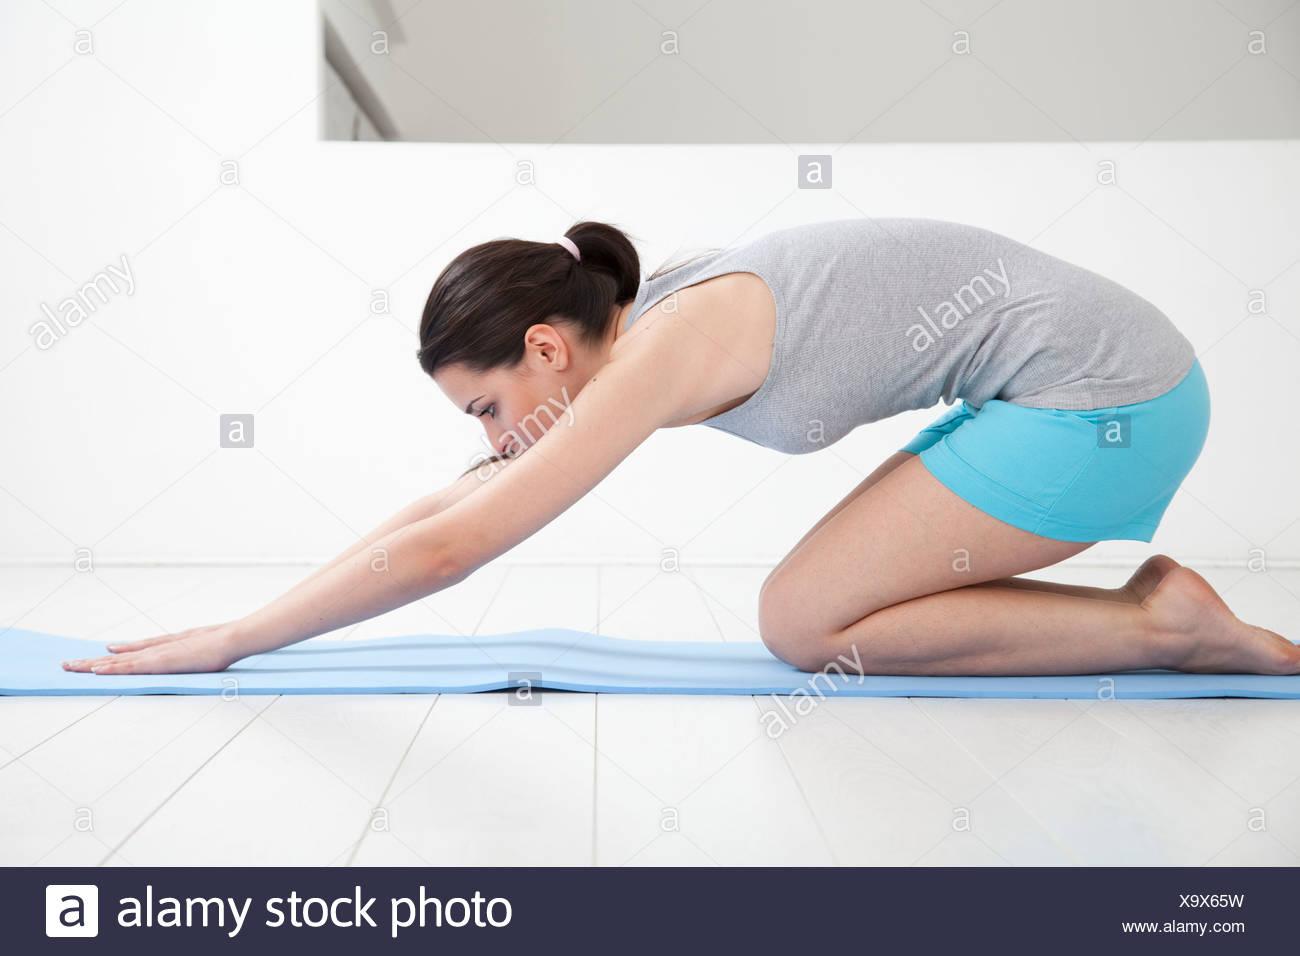 Frau erstreckt sich auf Yoga-Matte Stockbild